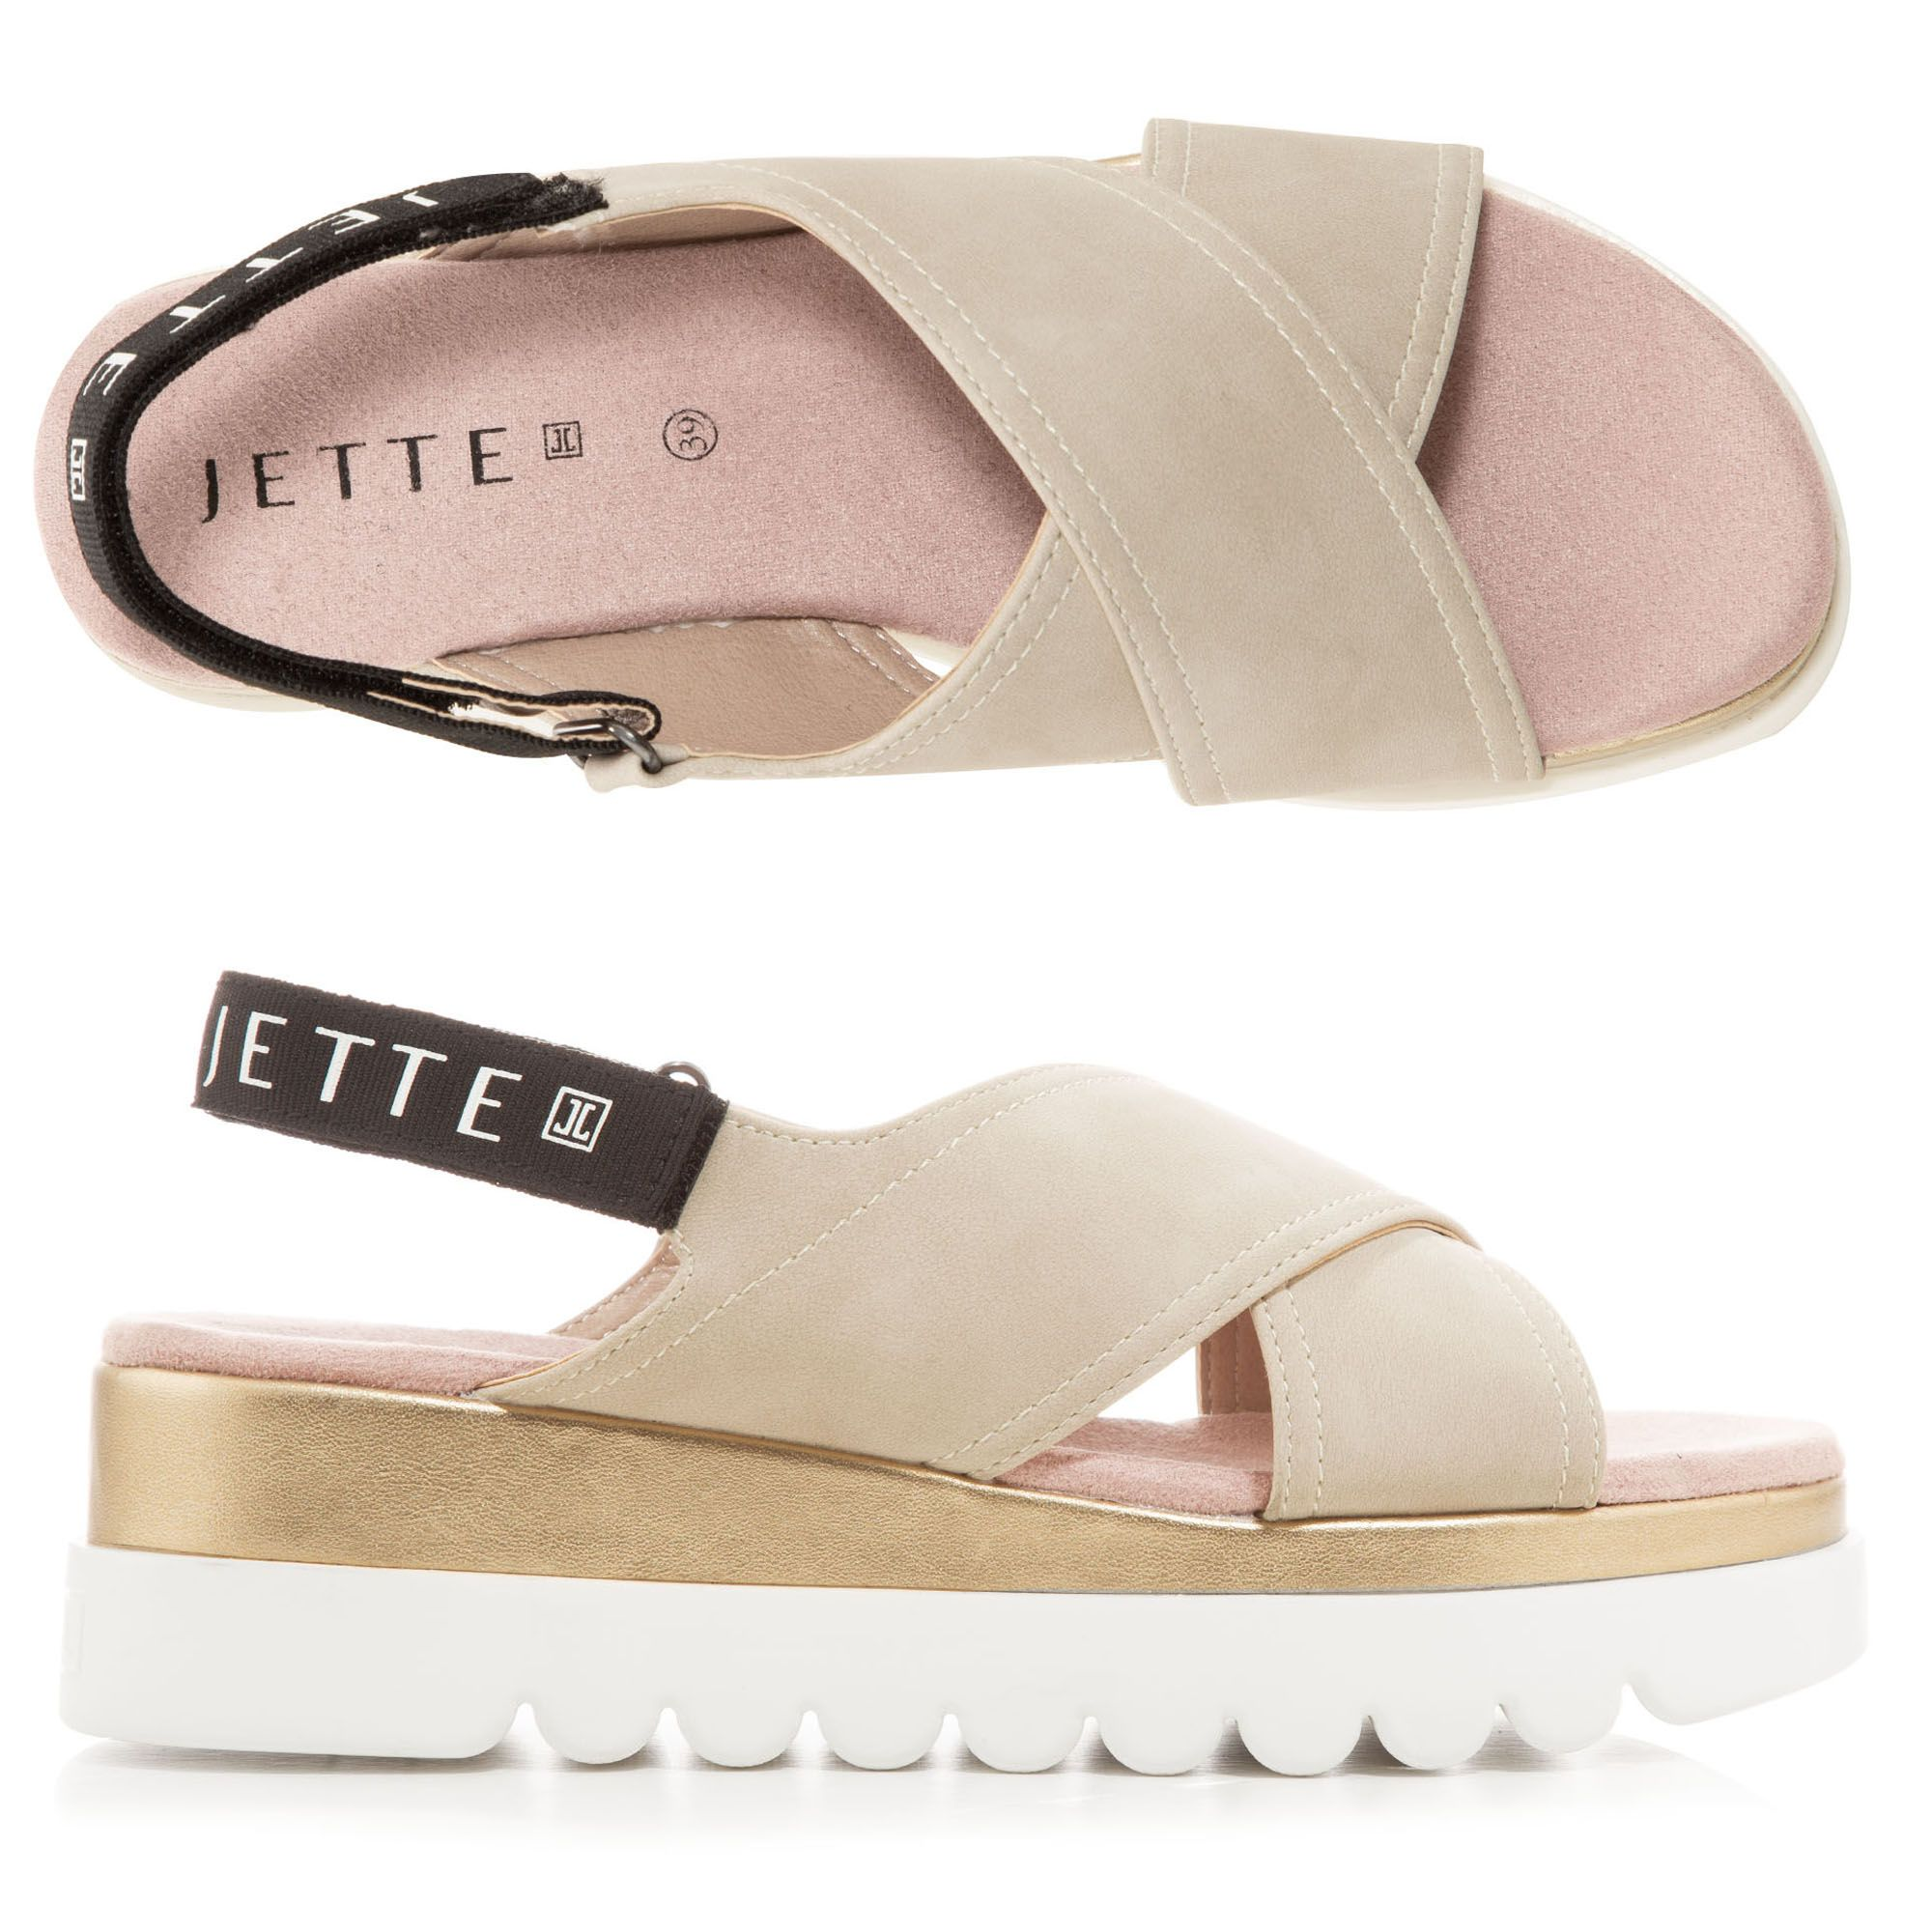 Jette Damen — Lederimitat Klettverschluss Sohle Sandale Weiße hrdxtsQC